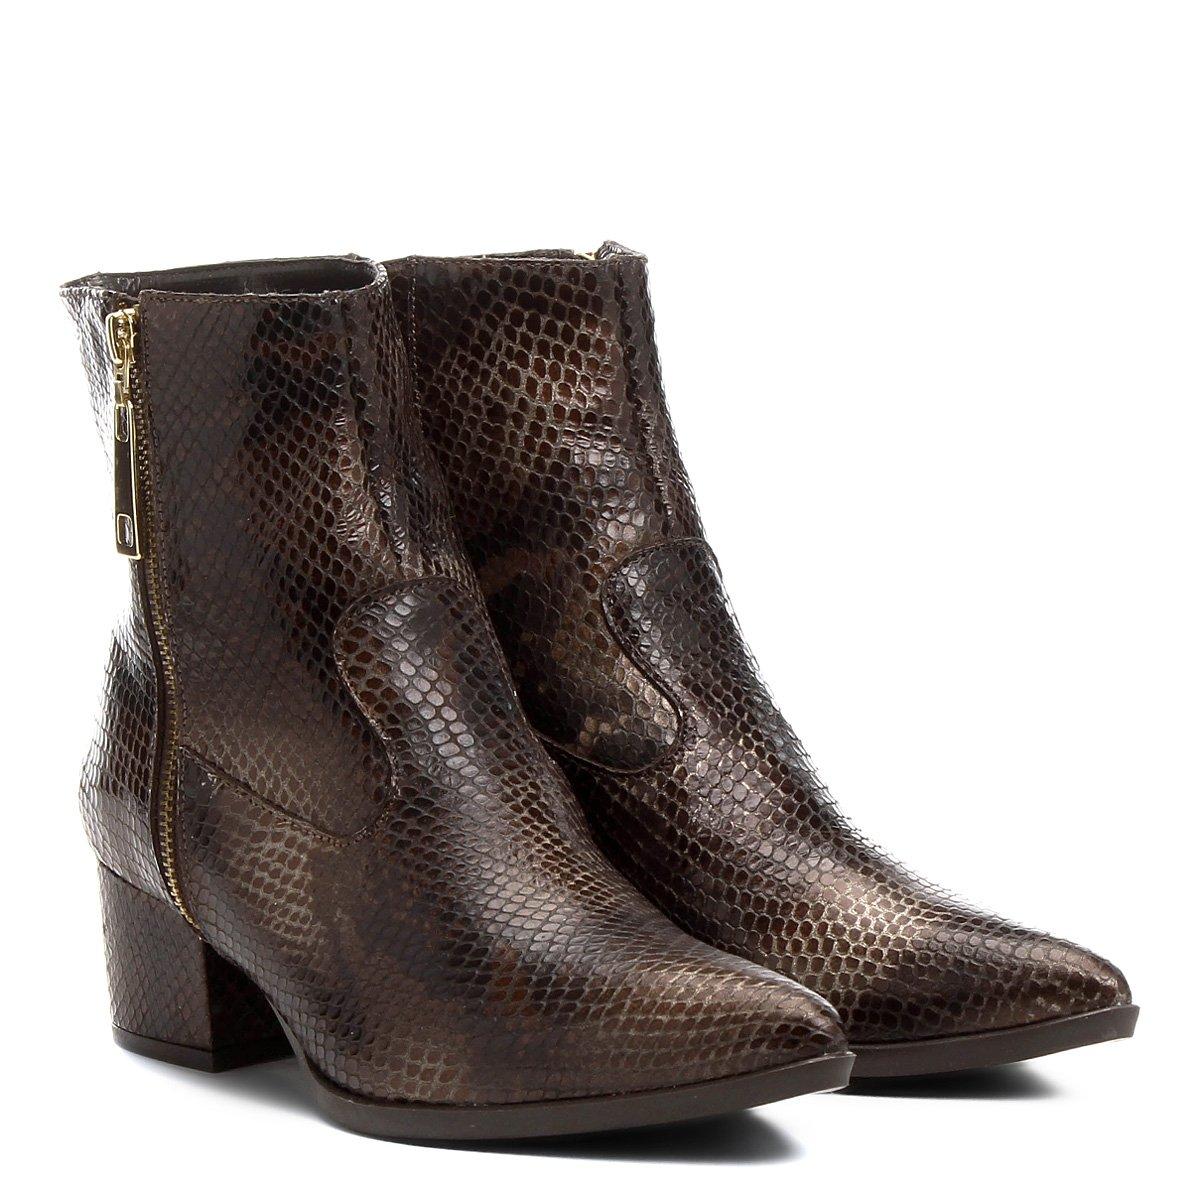 60f6e2c1f7 Bota Couro Cano Curto Shoestock Cobra Feminina